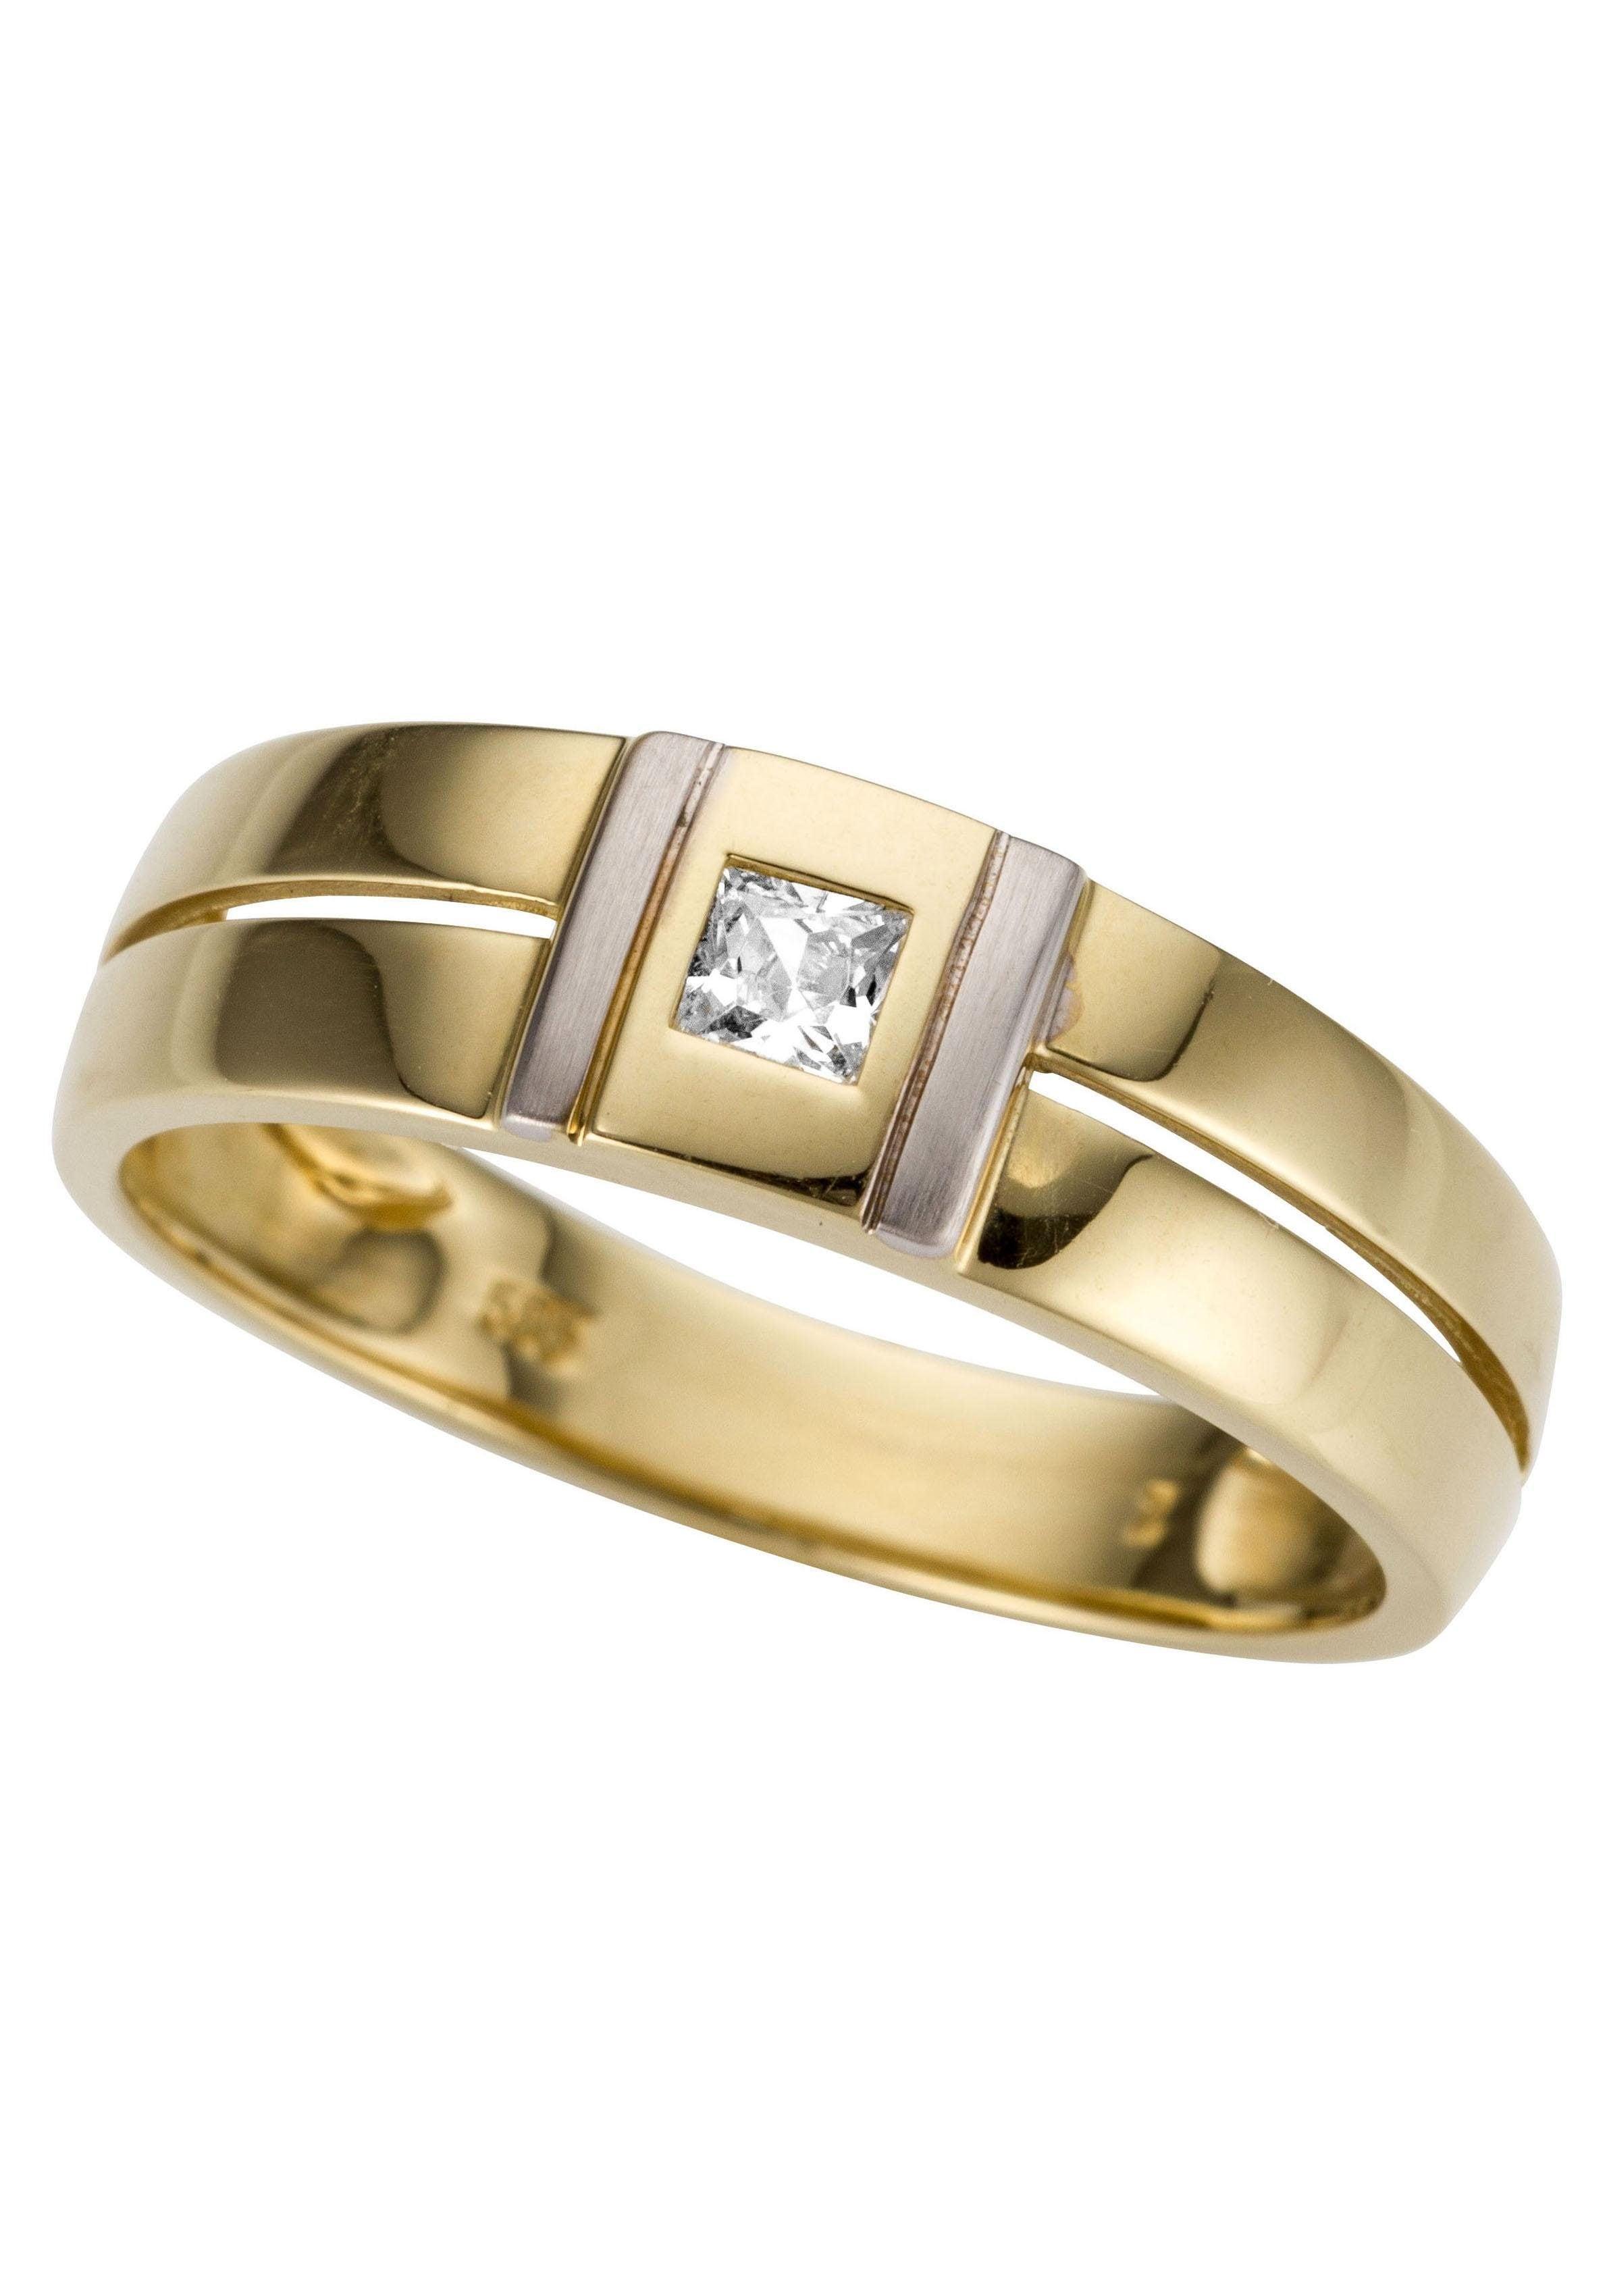 Firetti Goldring bicolor glanz rhodiniert massiv teilweise mehrreihig quadratisch | Schmuck > Ringe > Goldringe | Firetti